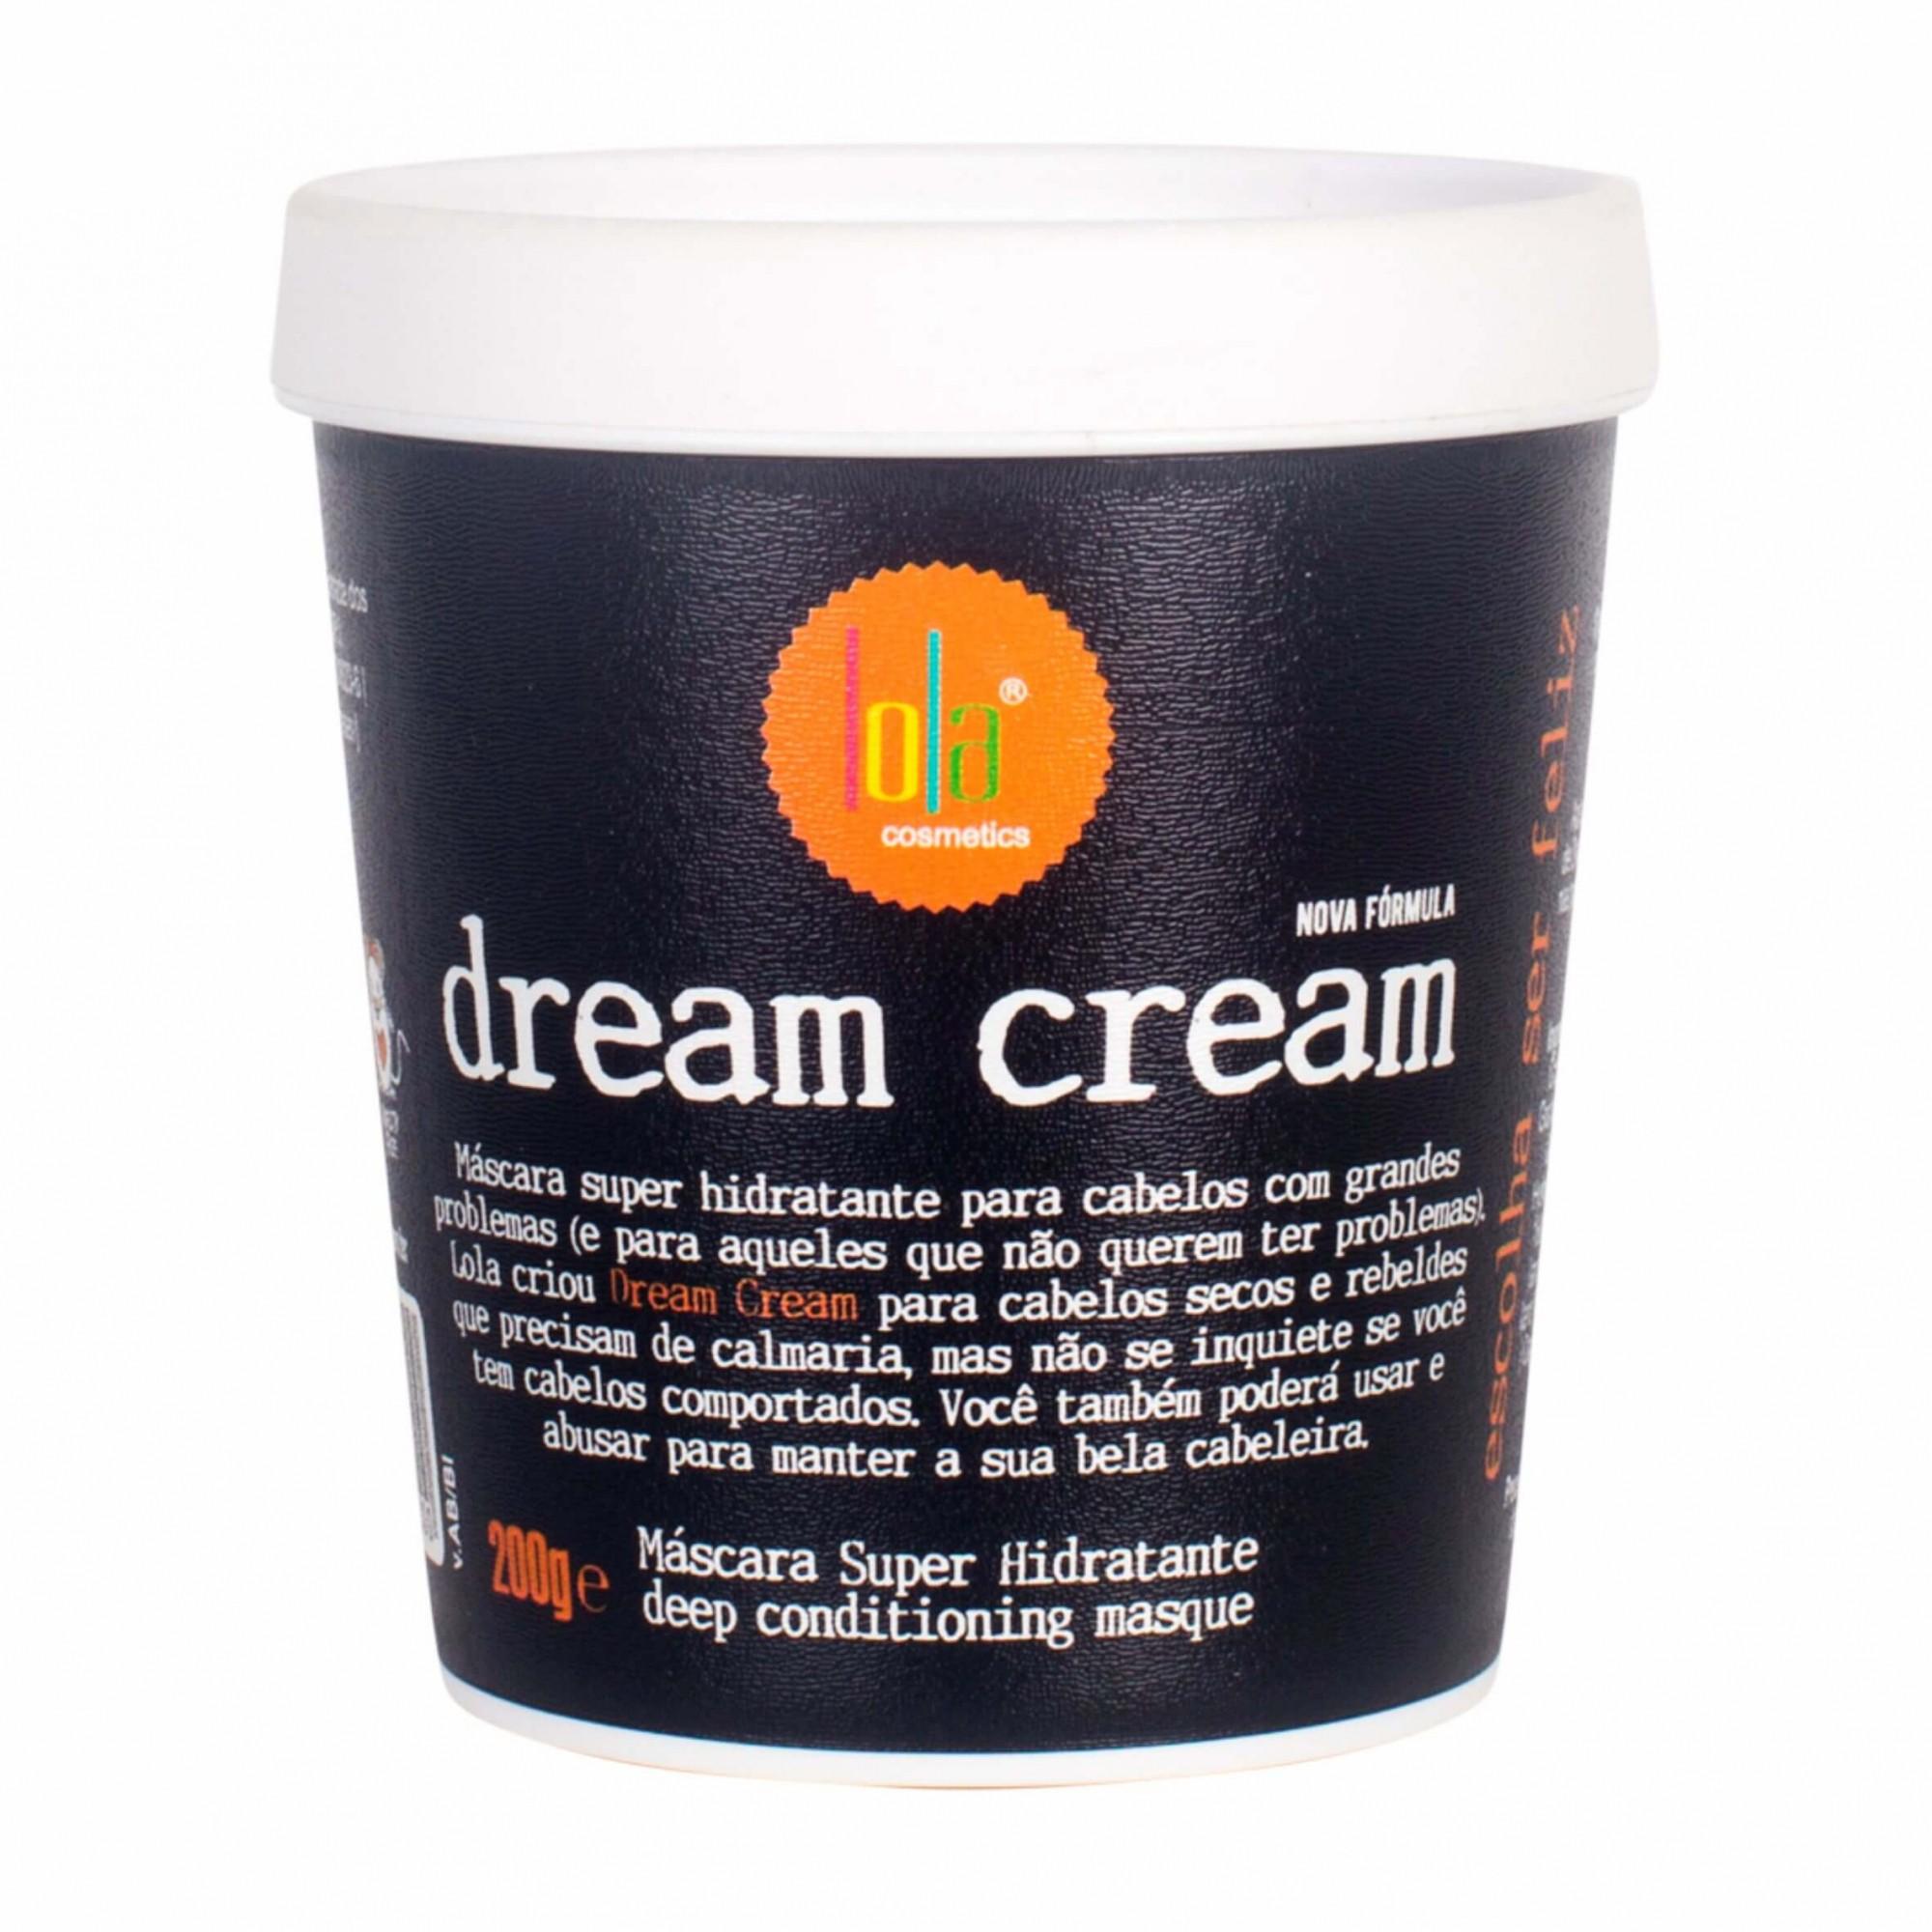 Lola Cosméticos Dream Cream - Máscara Capilar 200g